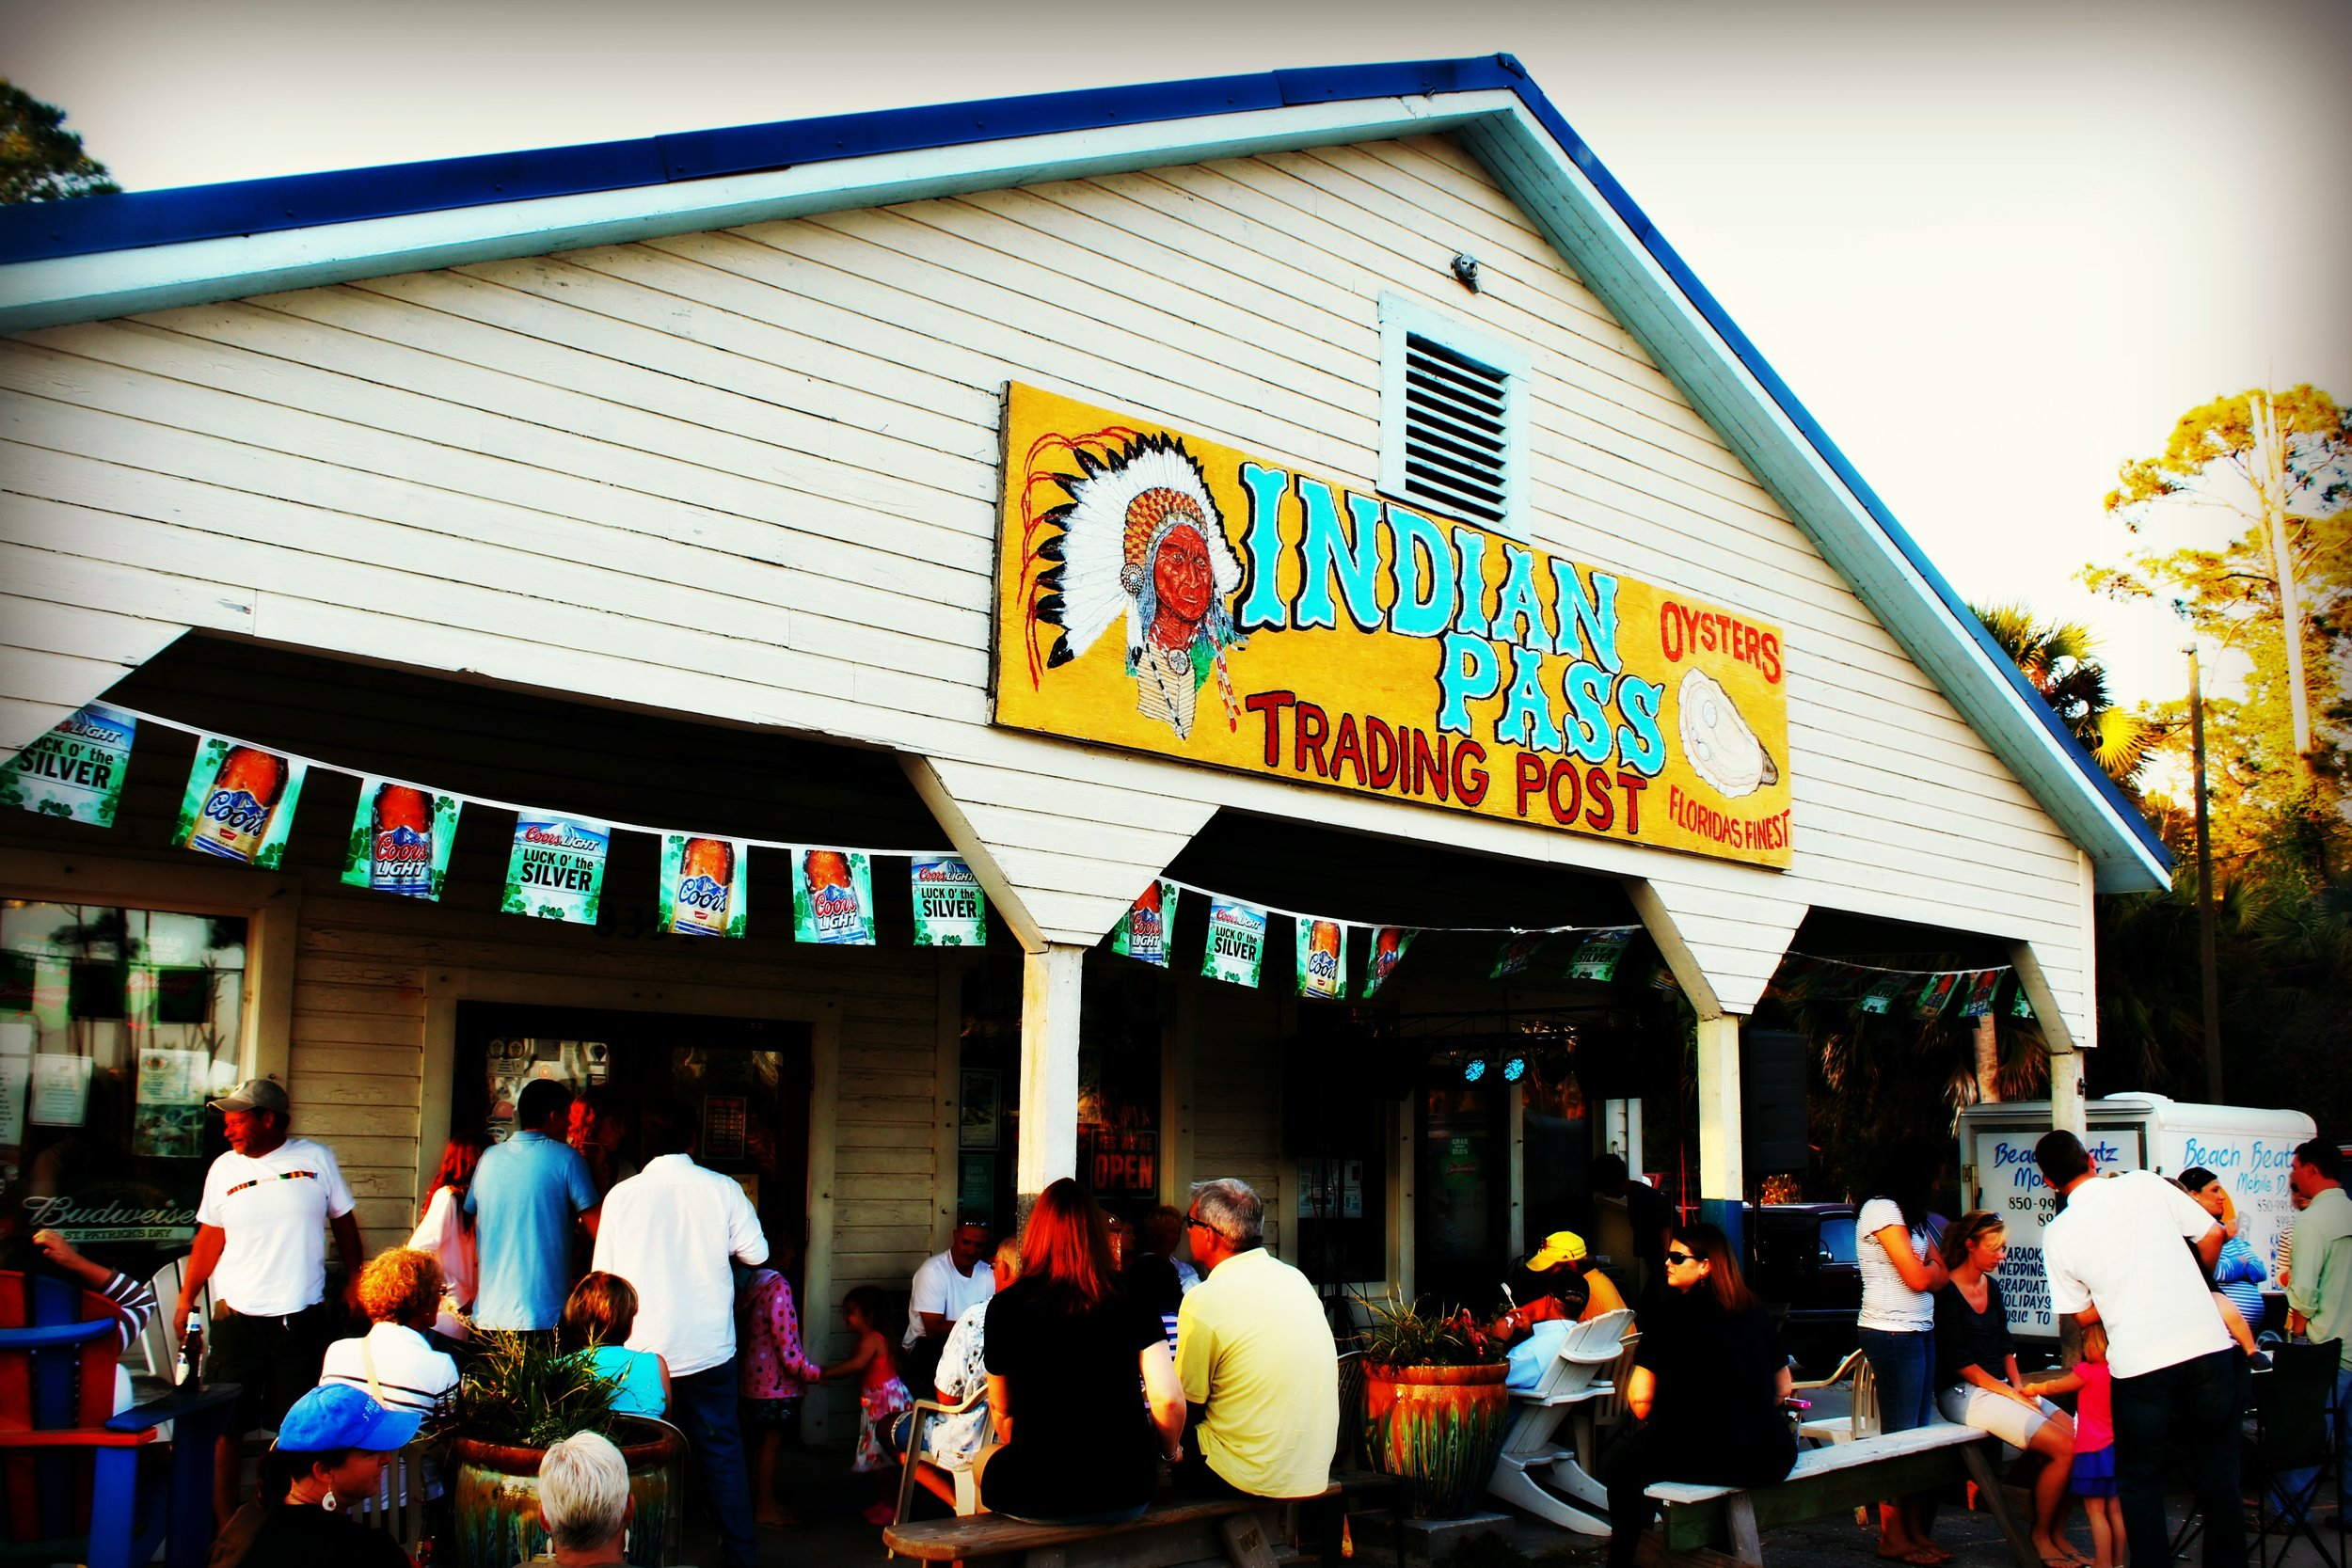 indian-pass-trading-post-raw-oyster-bar-florida